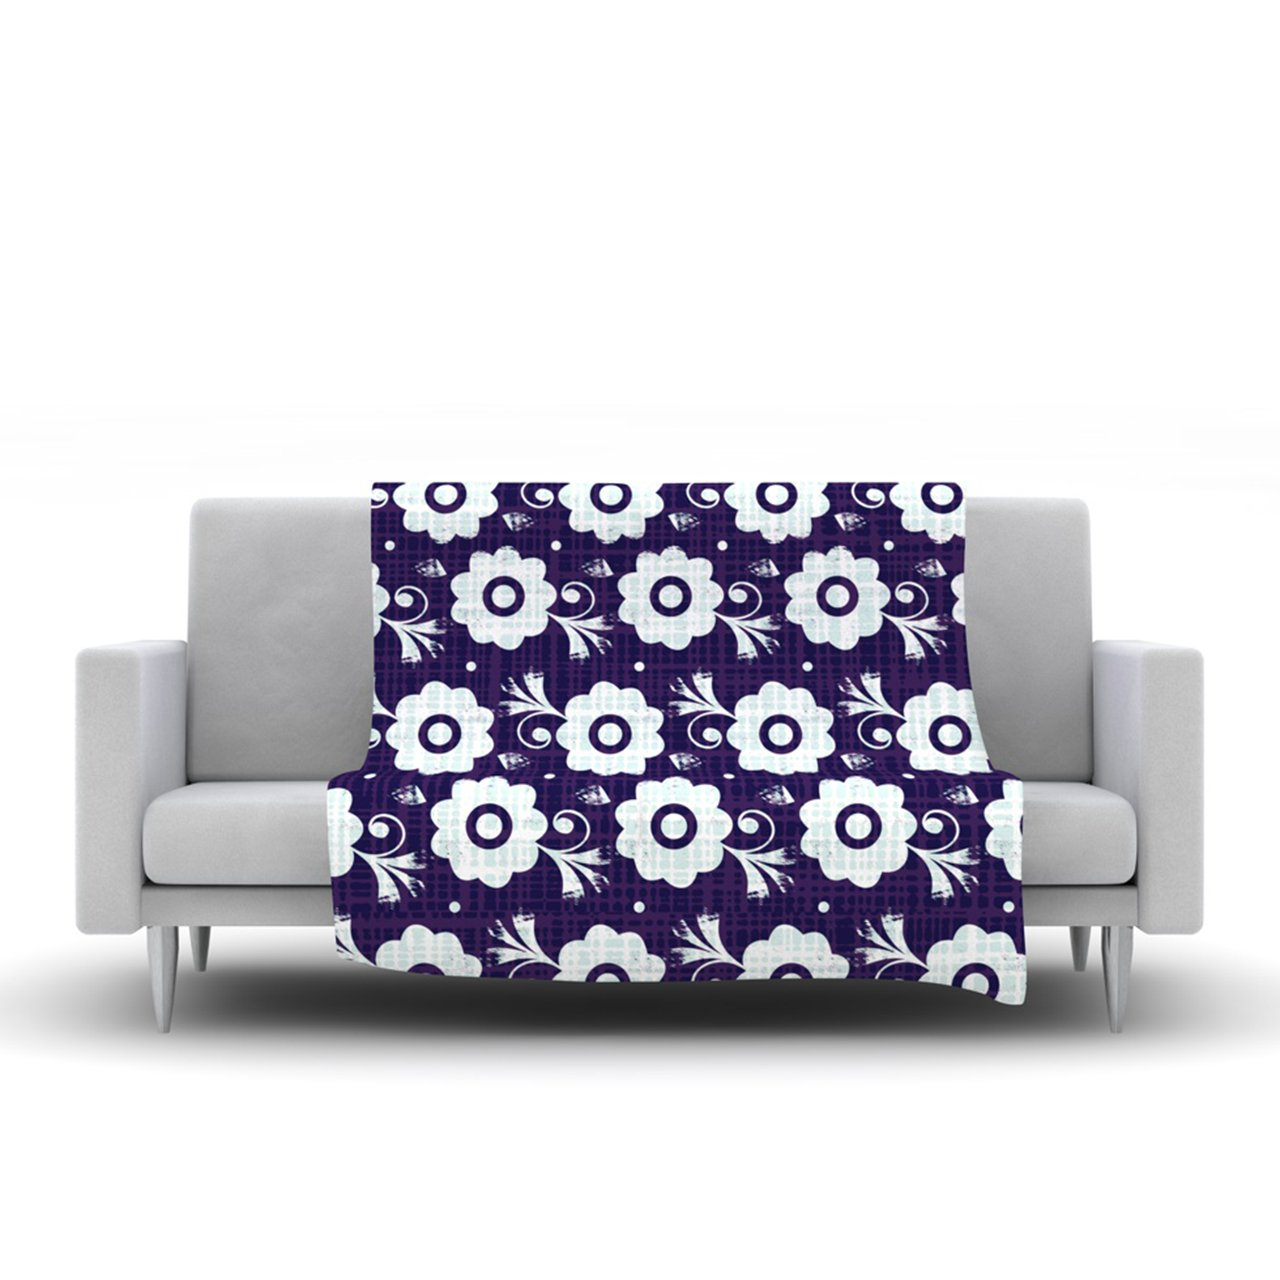 40 x 30 Kess InHouse Louise Machado Navy Flower Purple White Fleece Throw Blanket